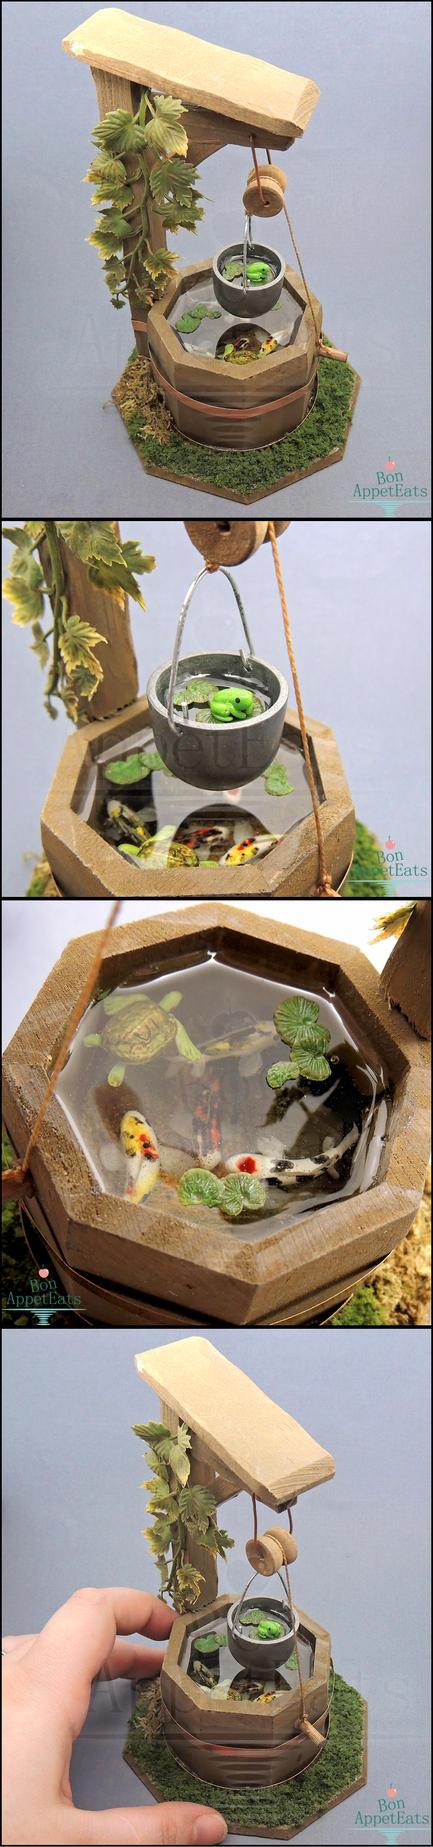 1:12 Dollhouse Scale Miniature Well Pond by Bon-AppetEats